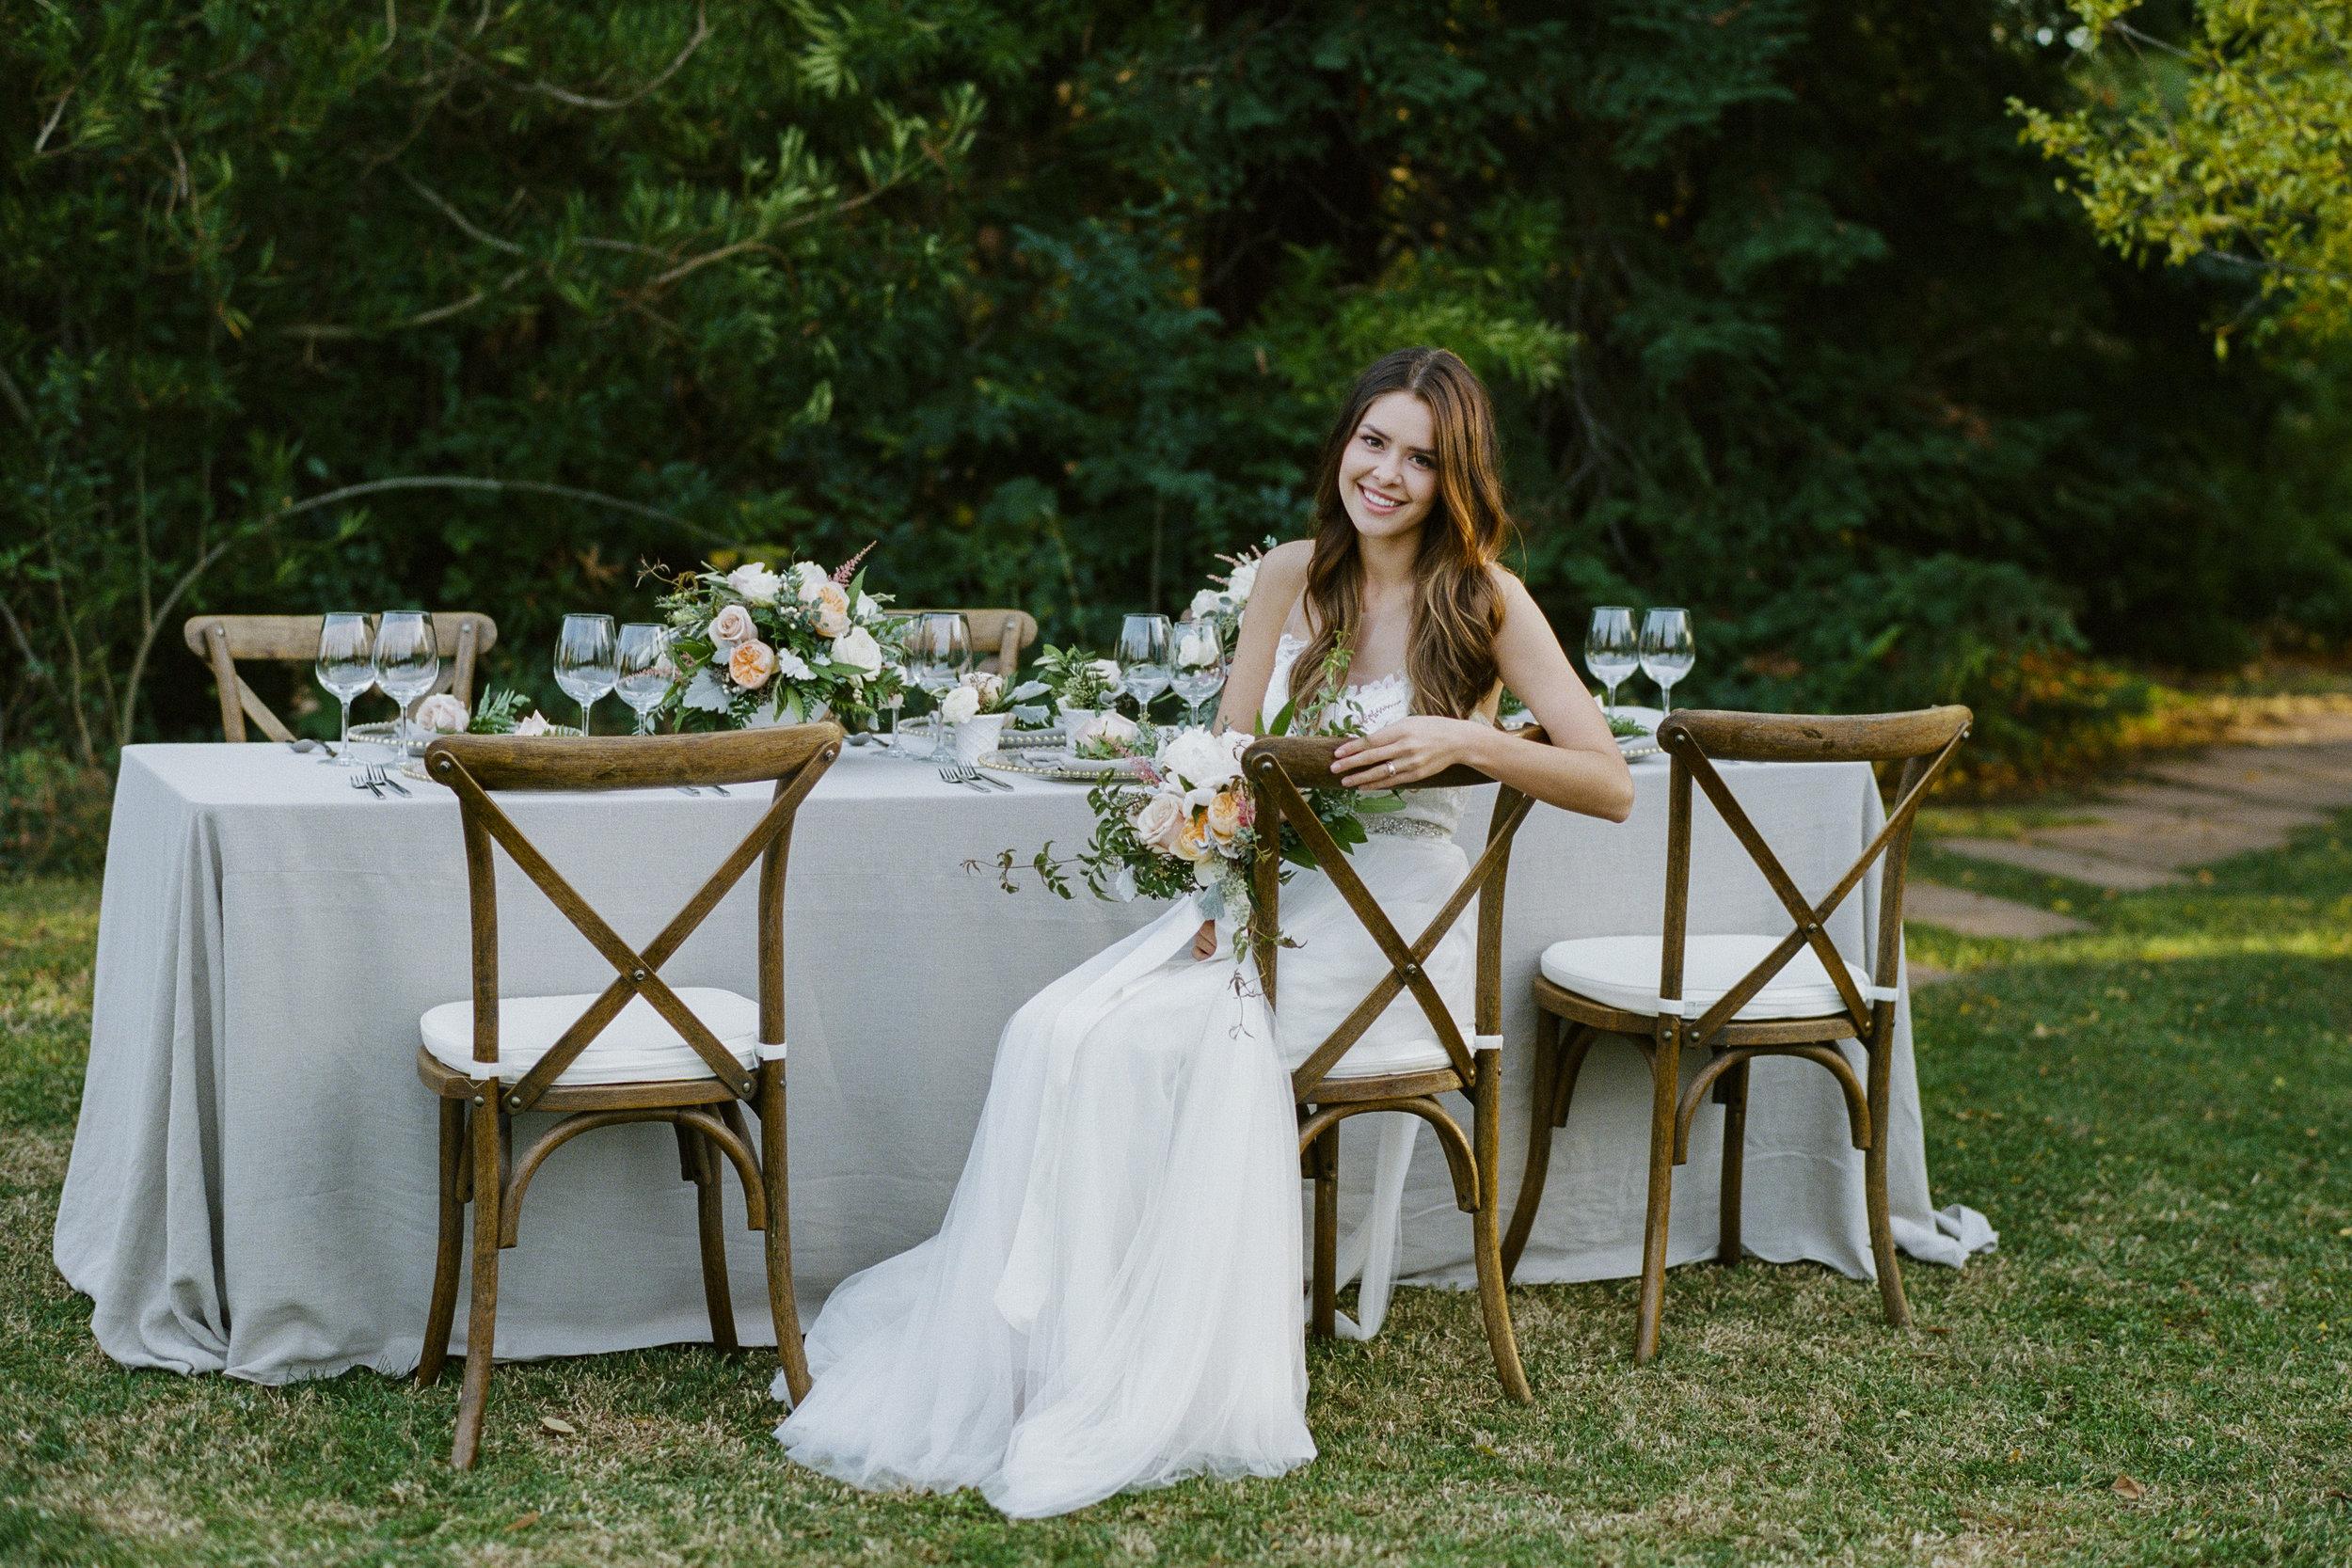 blush_flowers_tablescape_upscale_luxury_wedding_flowers_.jpg